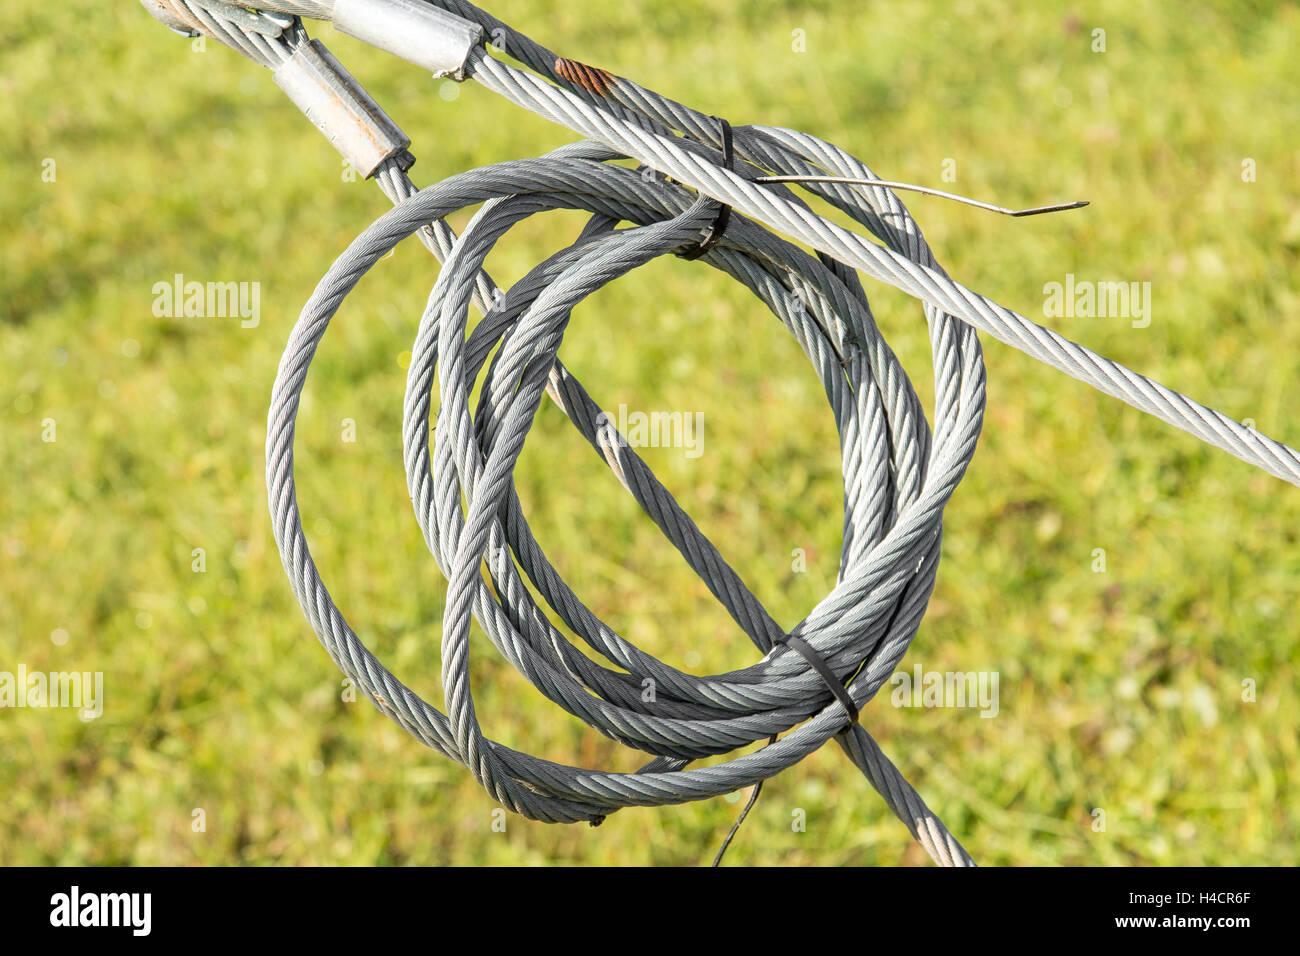 Wire Loop Stockfotos & Wire Loop Bilder - Alamy